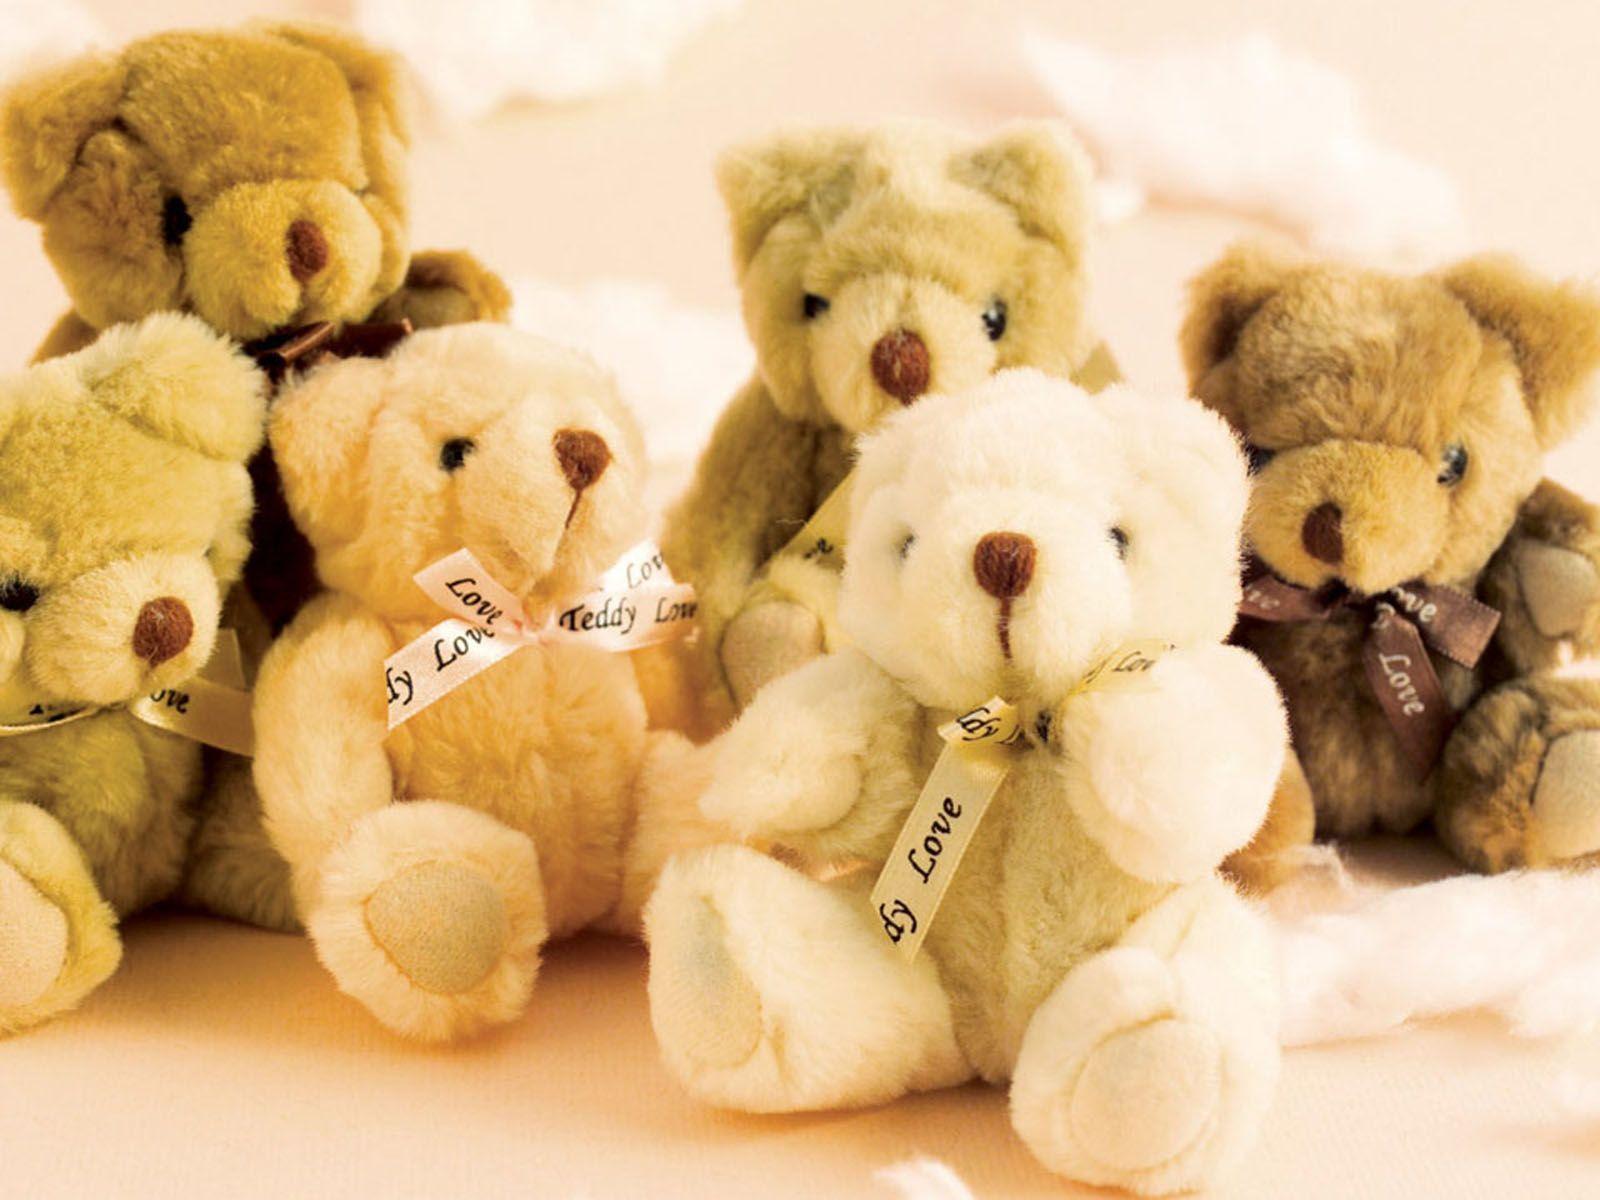 teddy bear wallpapers hd wallpapers